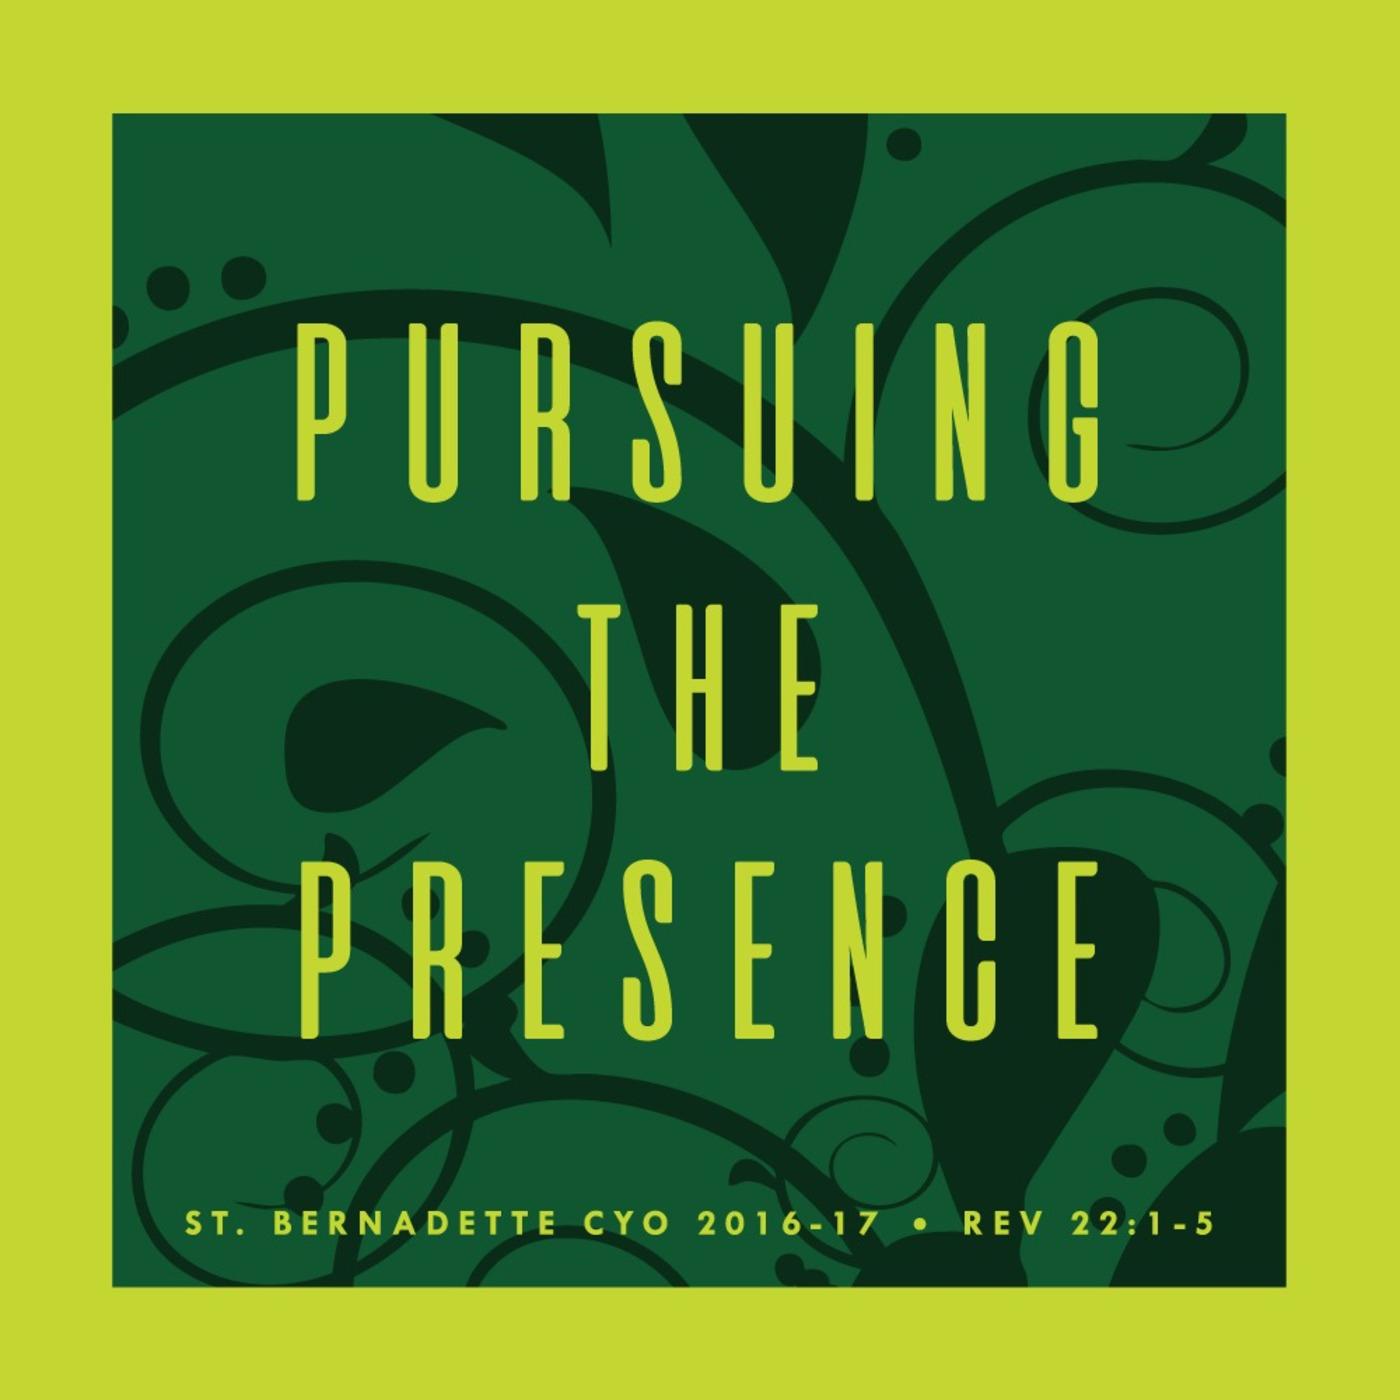 St. Bernadette CYO's Podcast